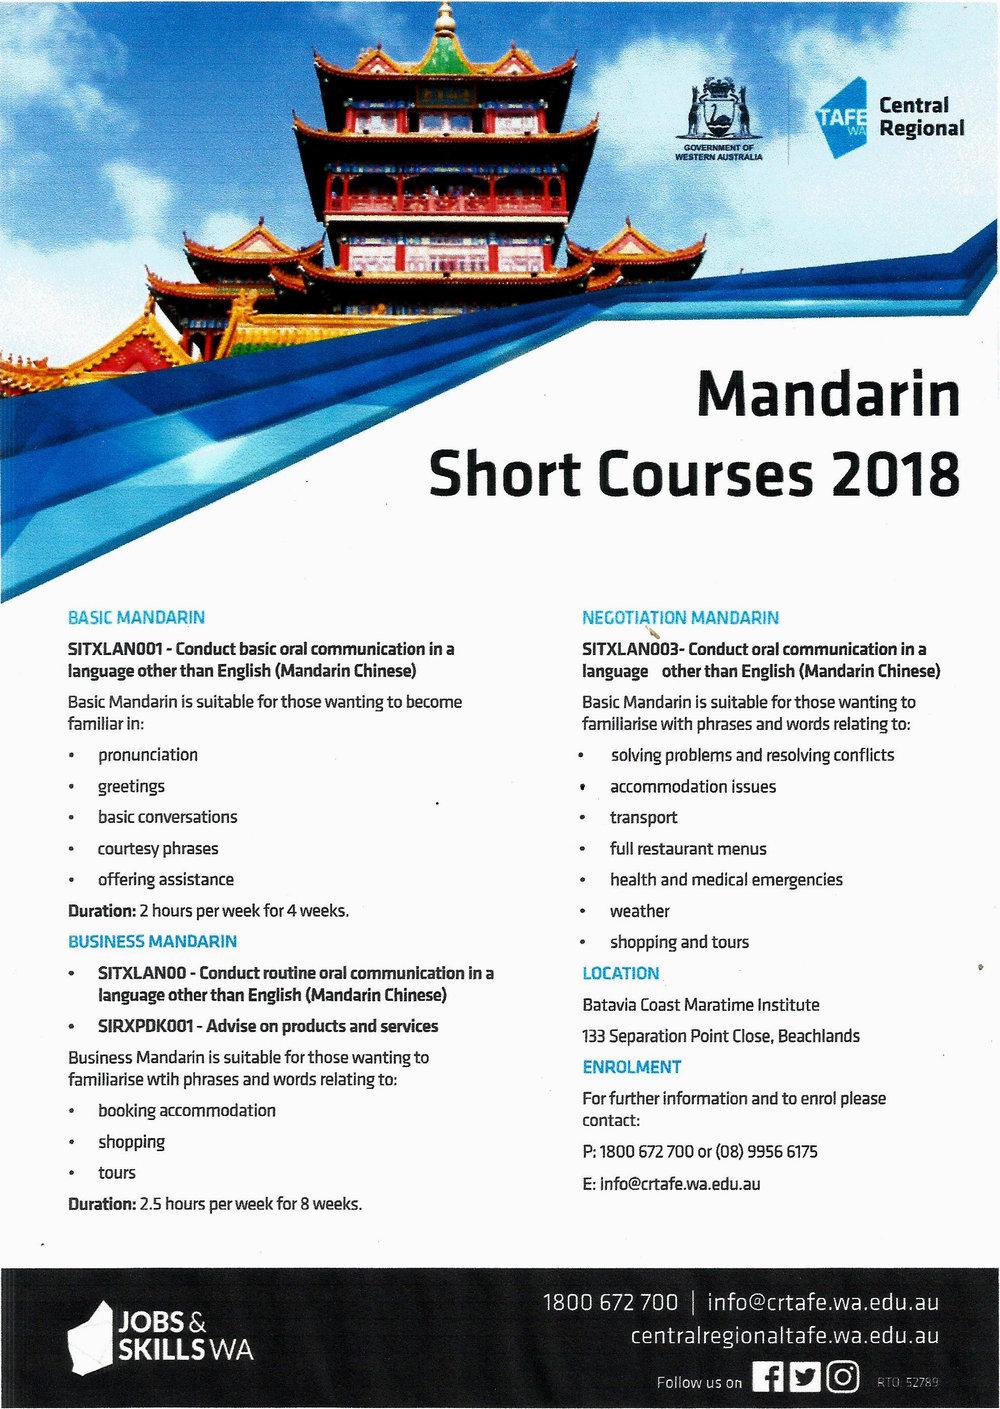 17967424_Tourism summit BCMI Mandarin flier.jpg